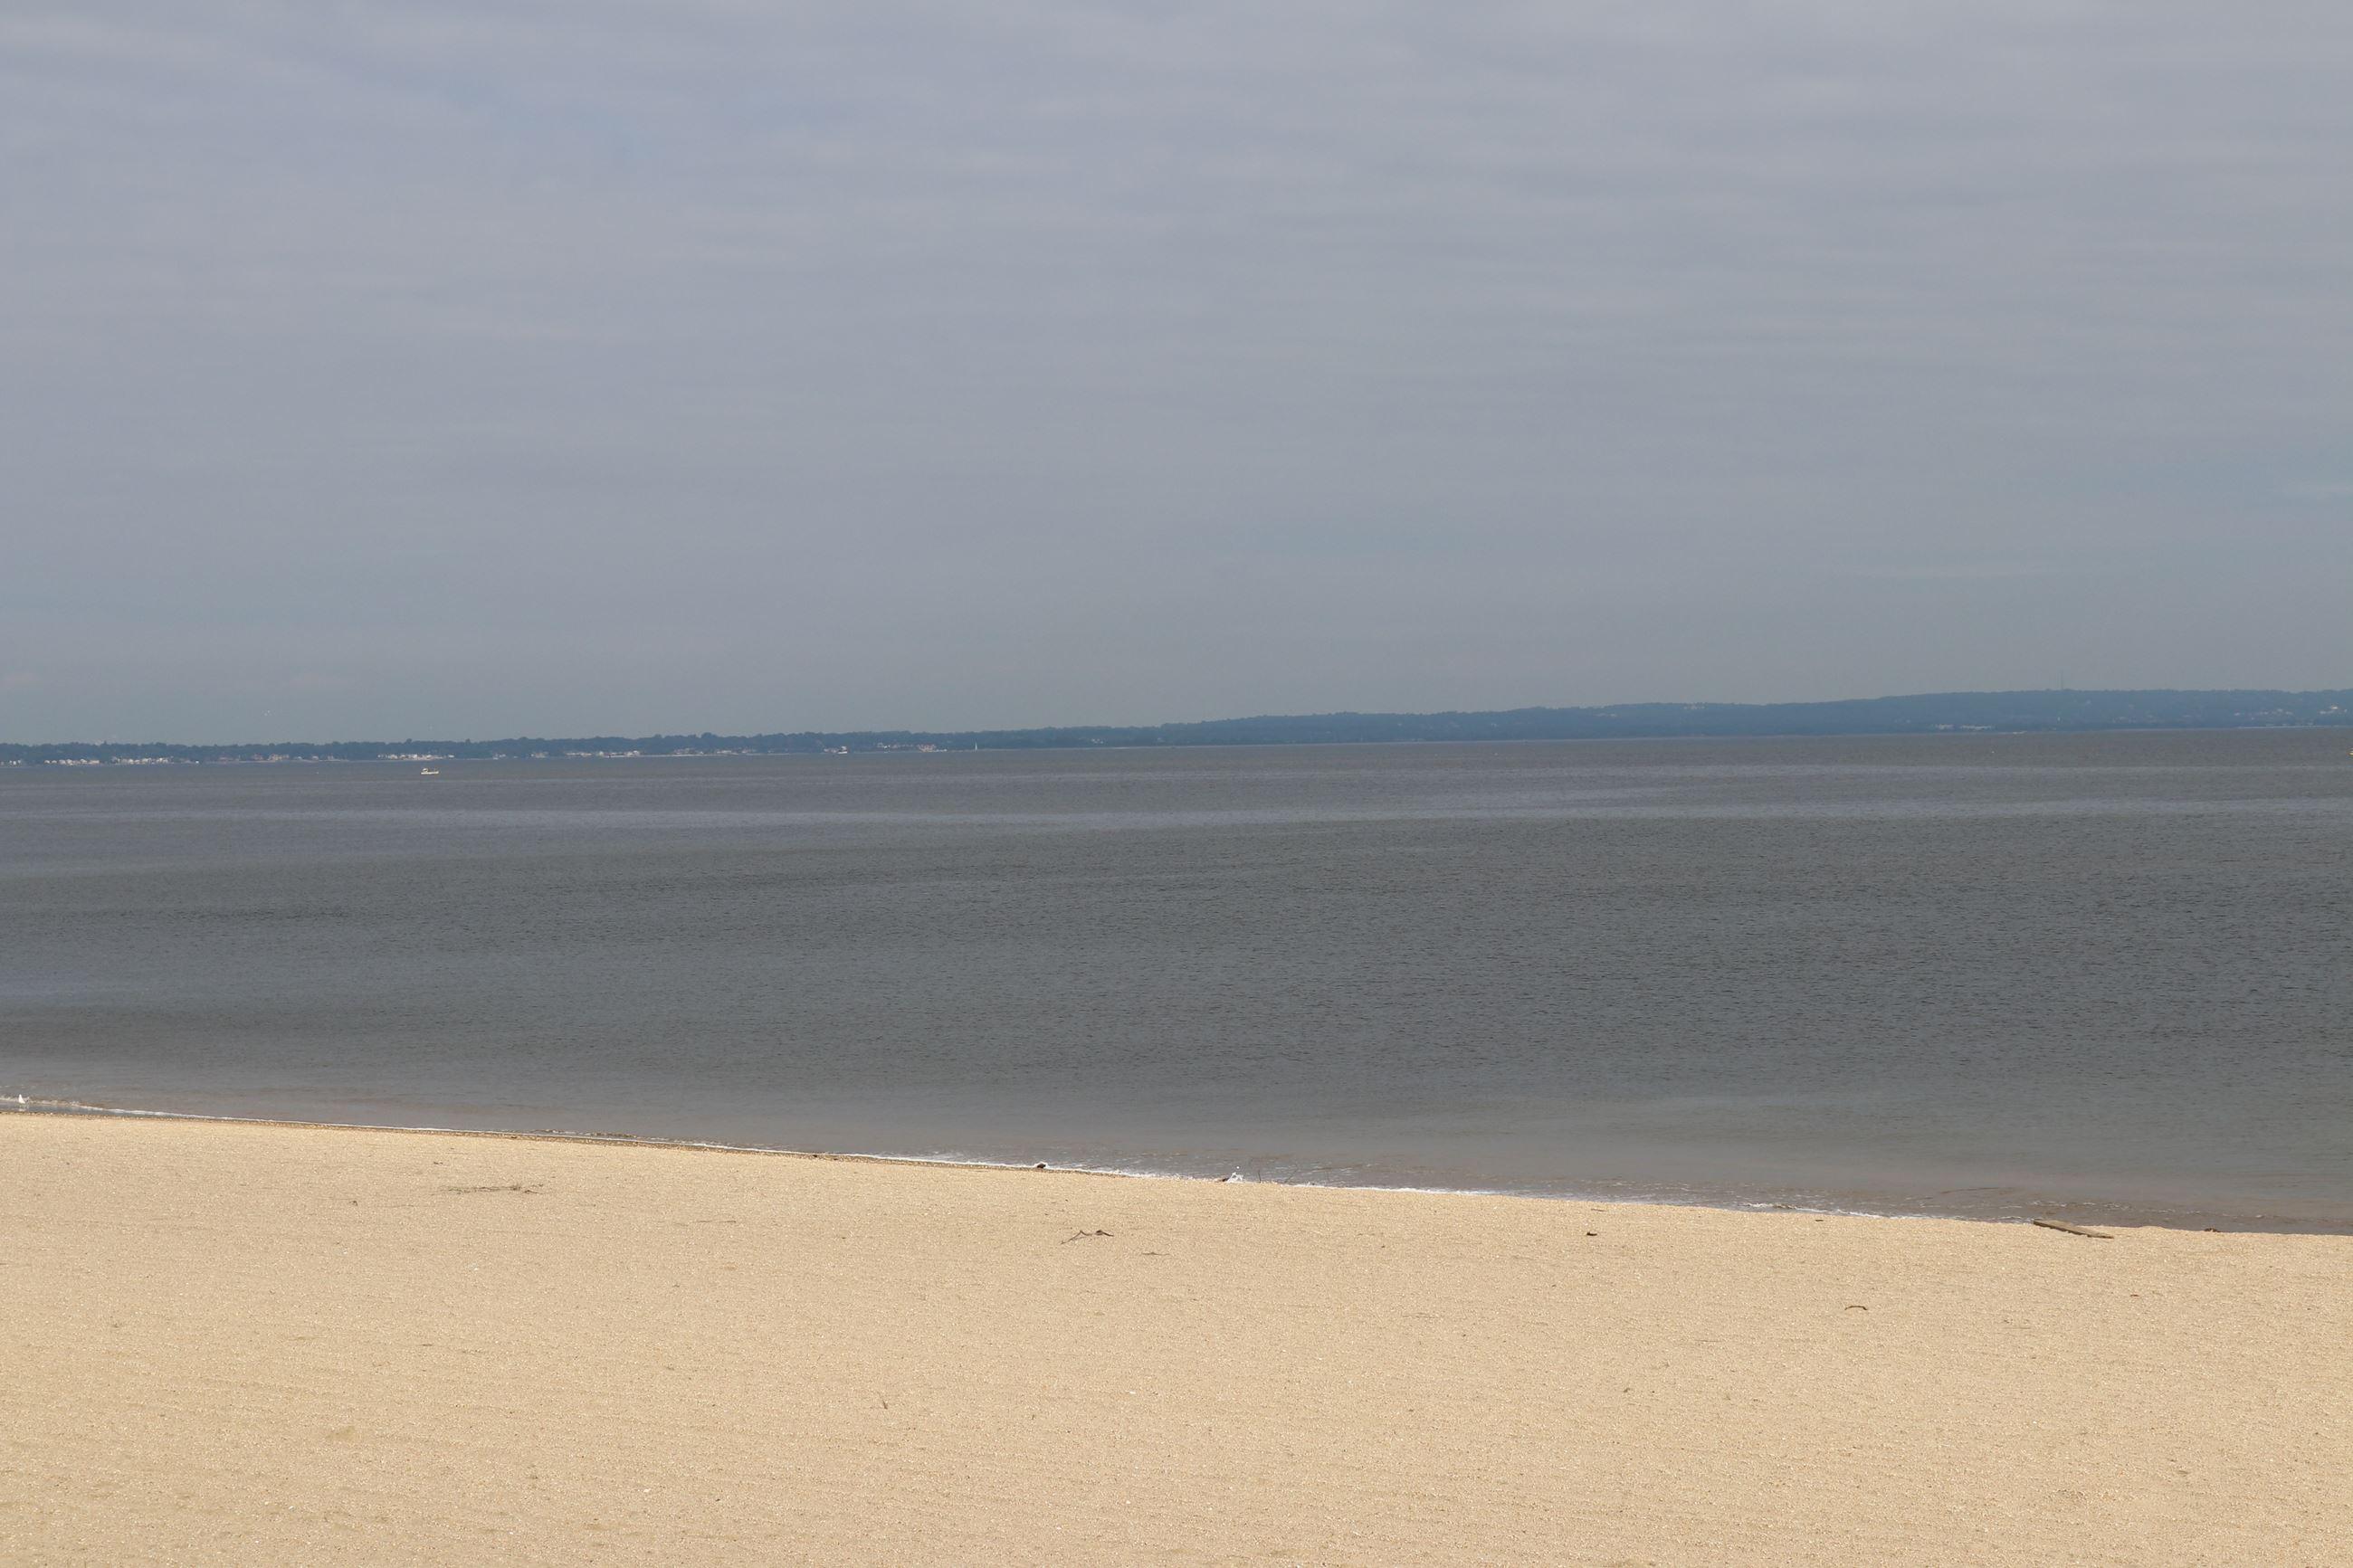 Ideal Beach Img 0502 0500 0501 0509 0510 0514 0511